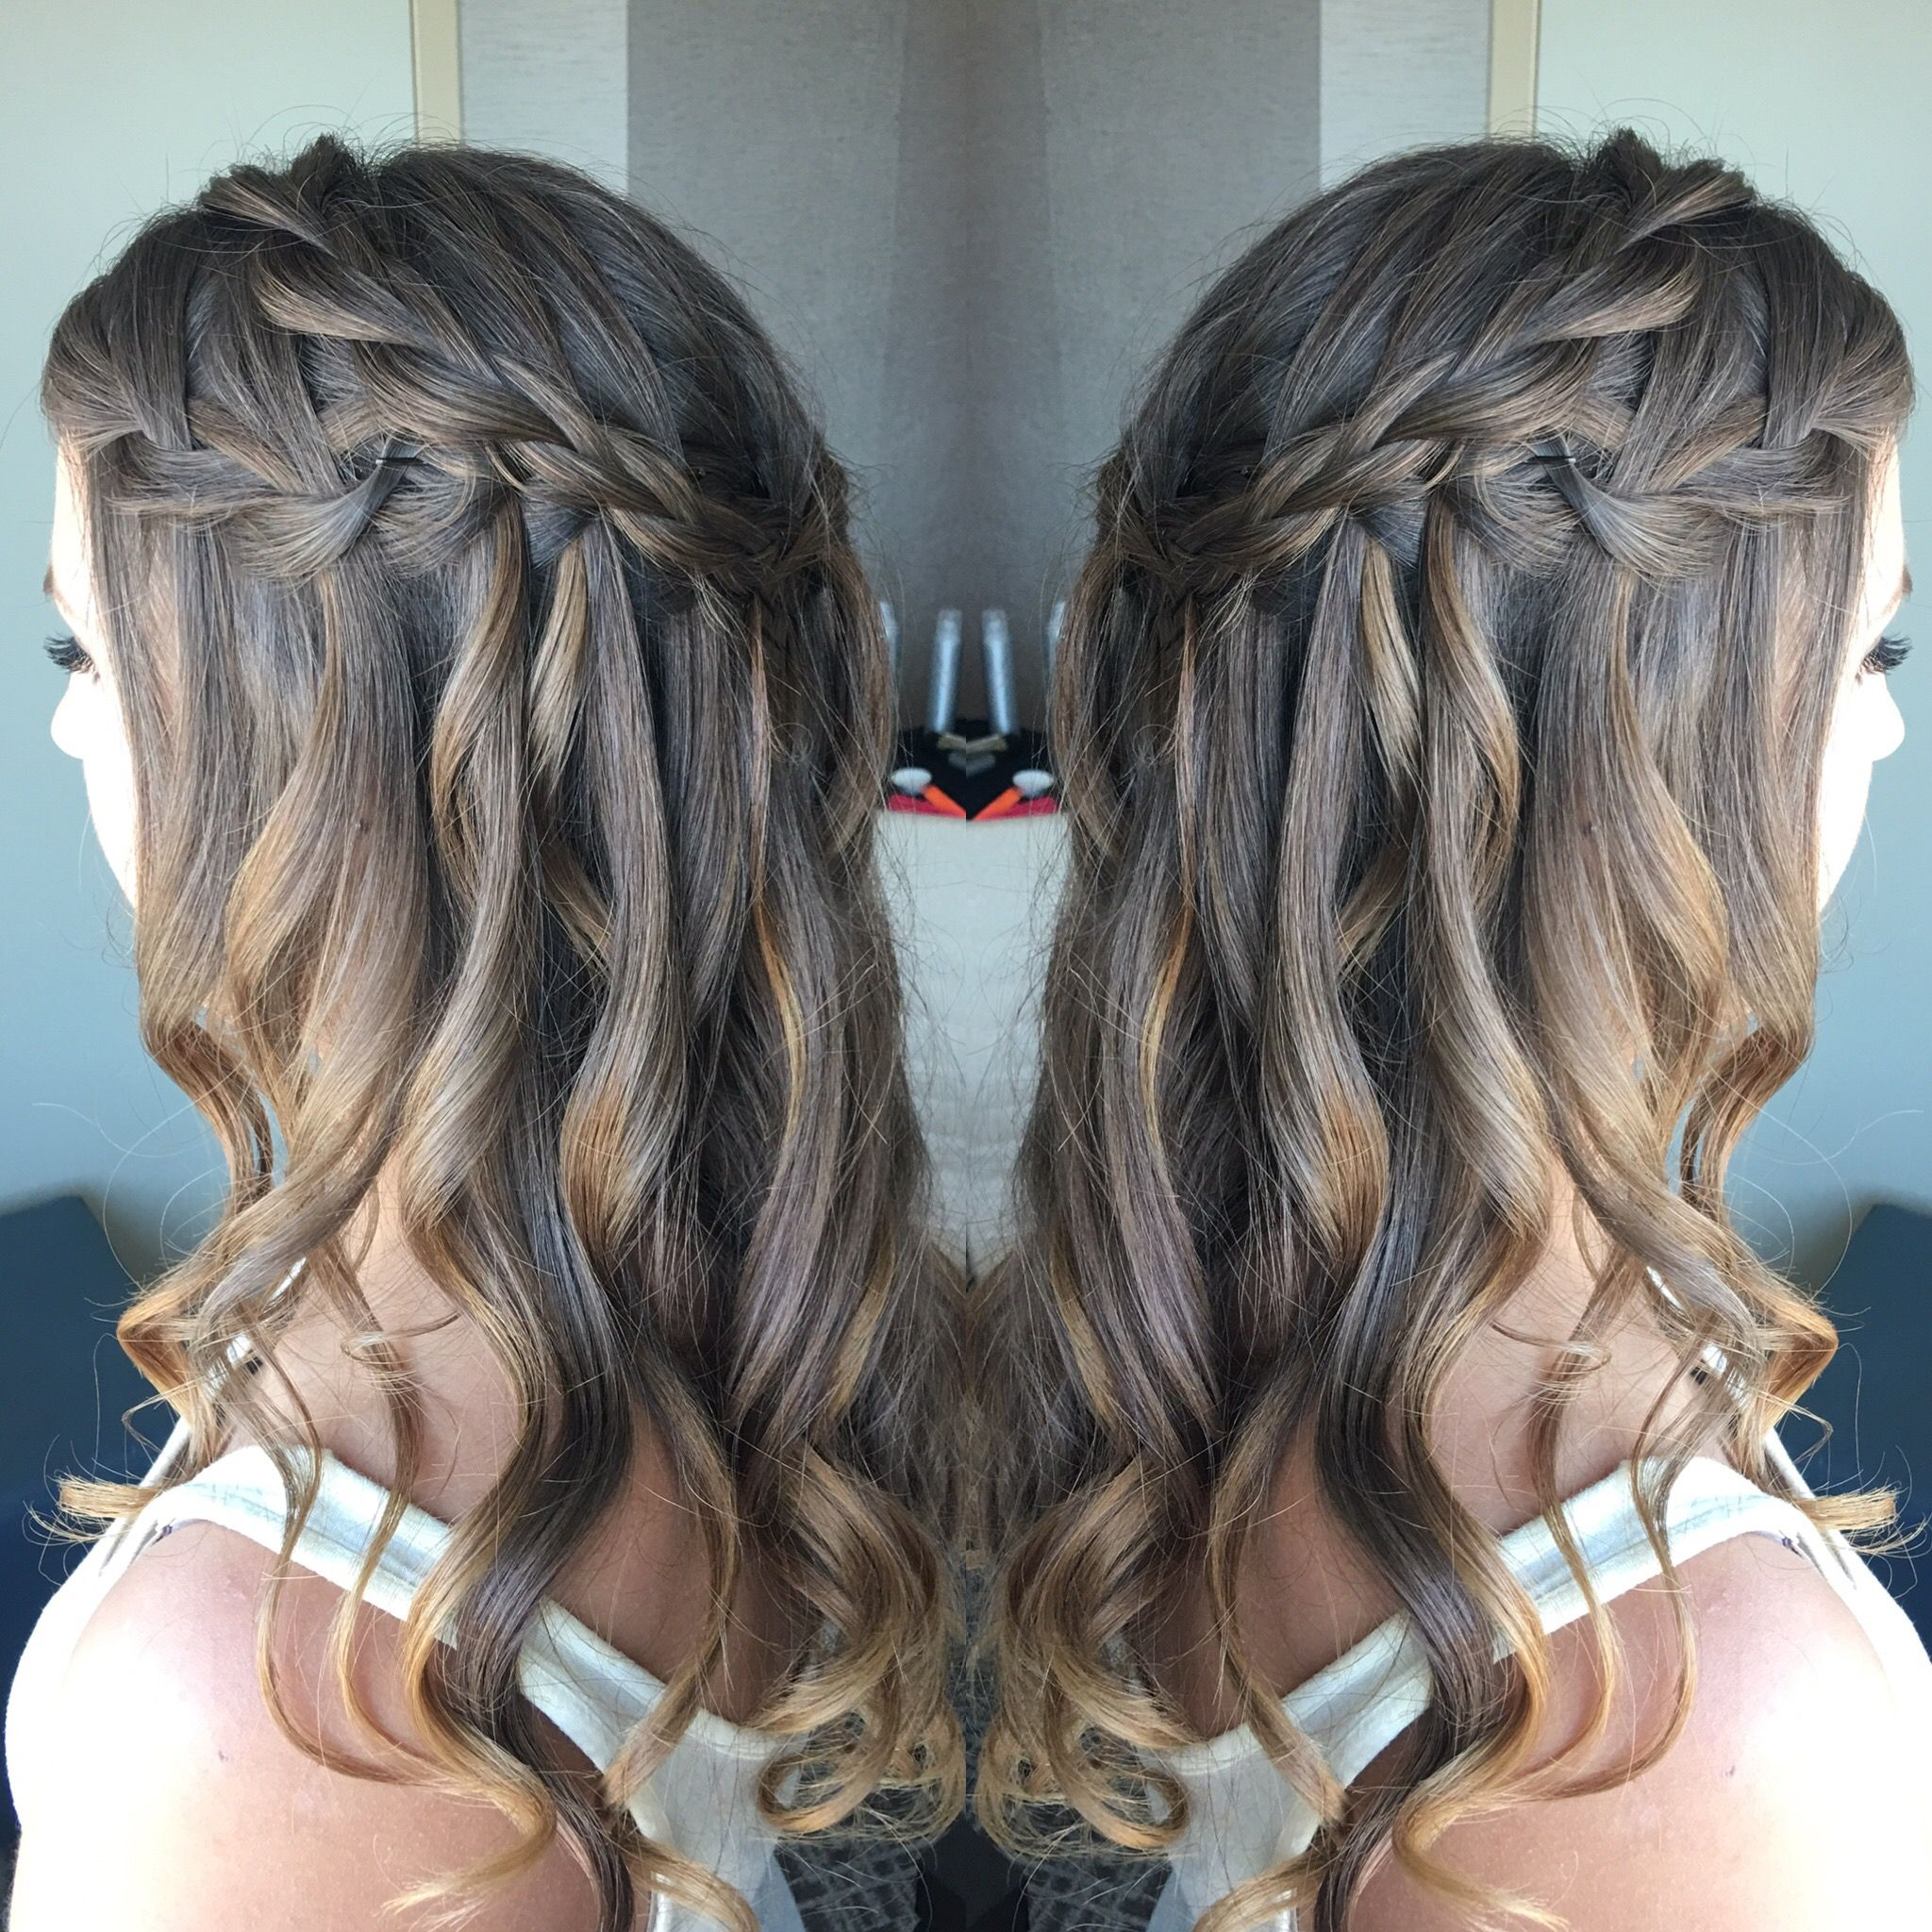 braided waterfall wedding hairstyle | half up half down hairstyles